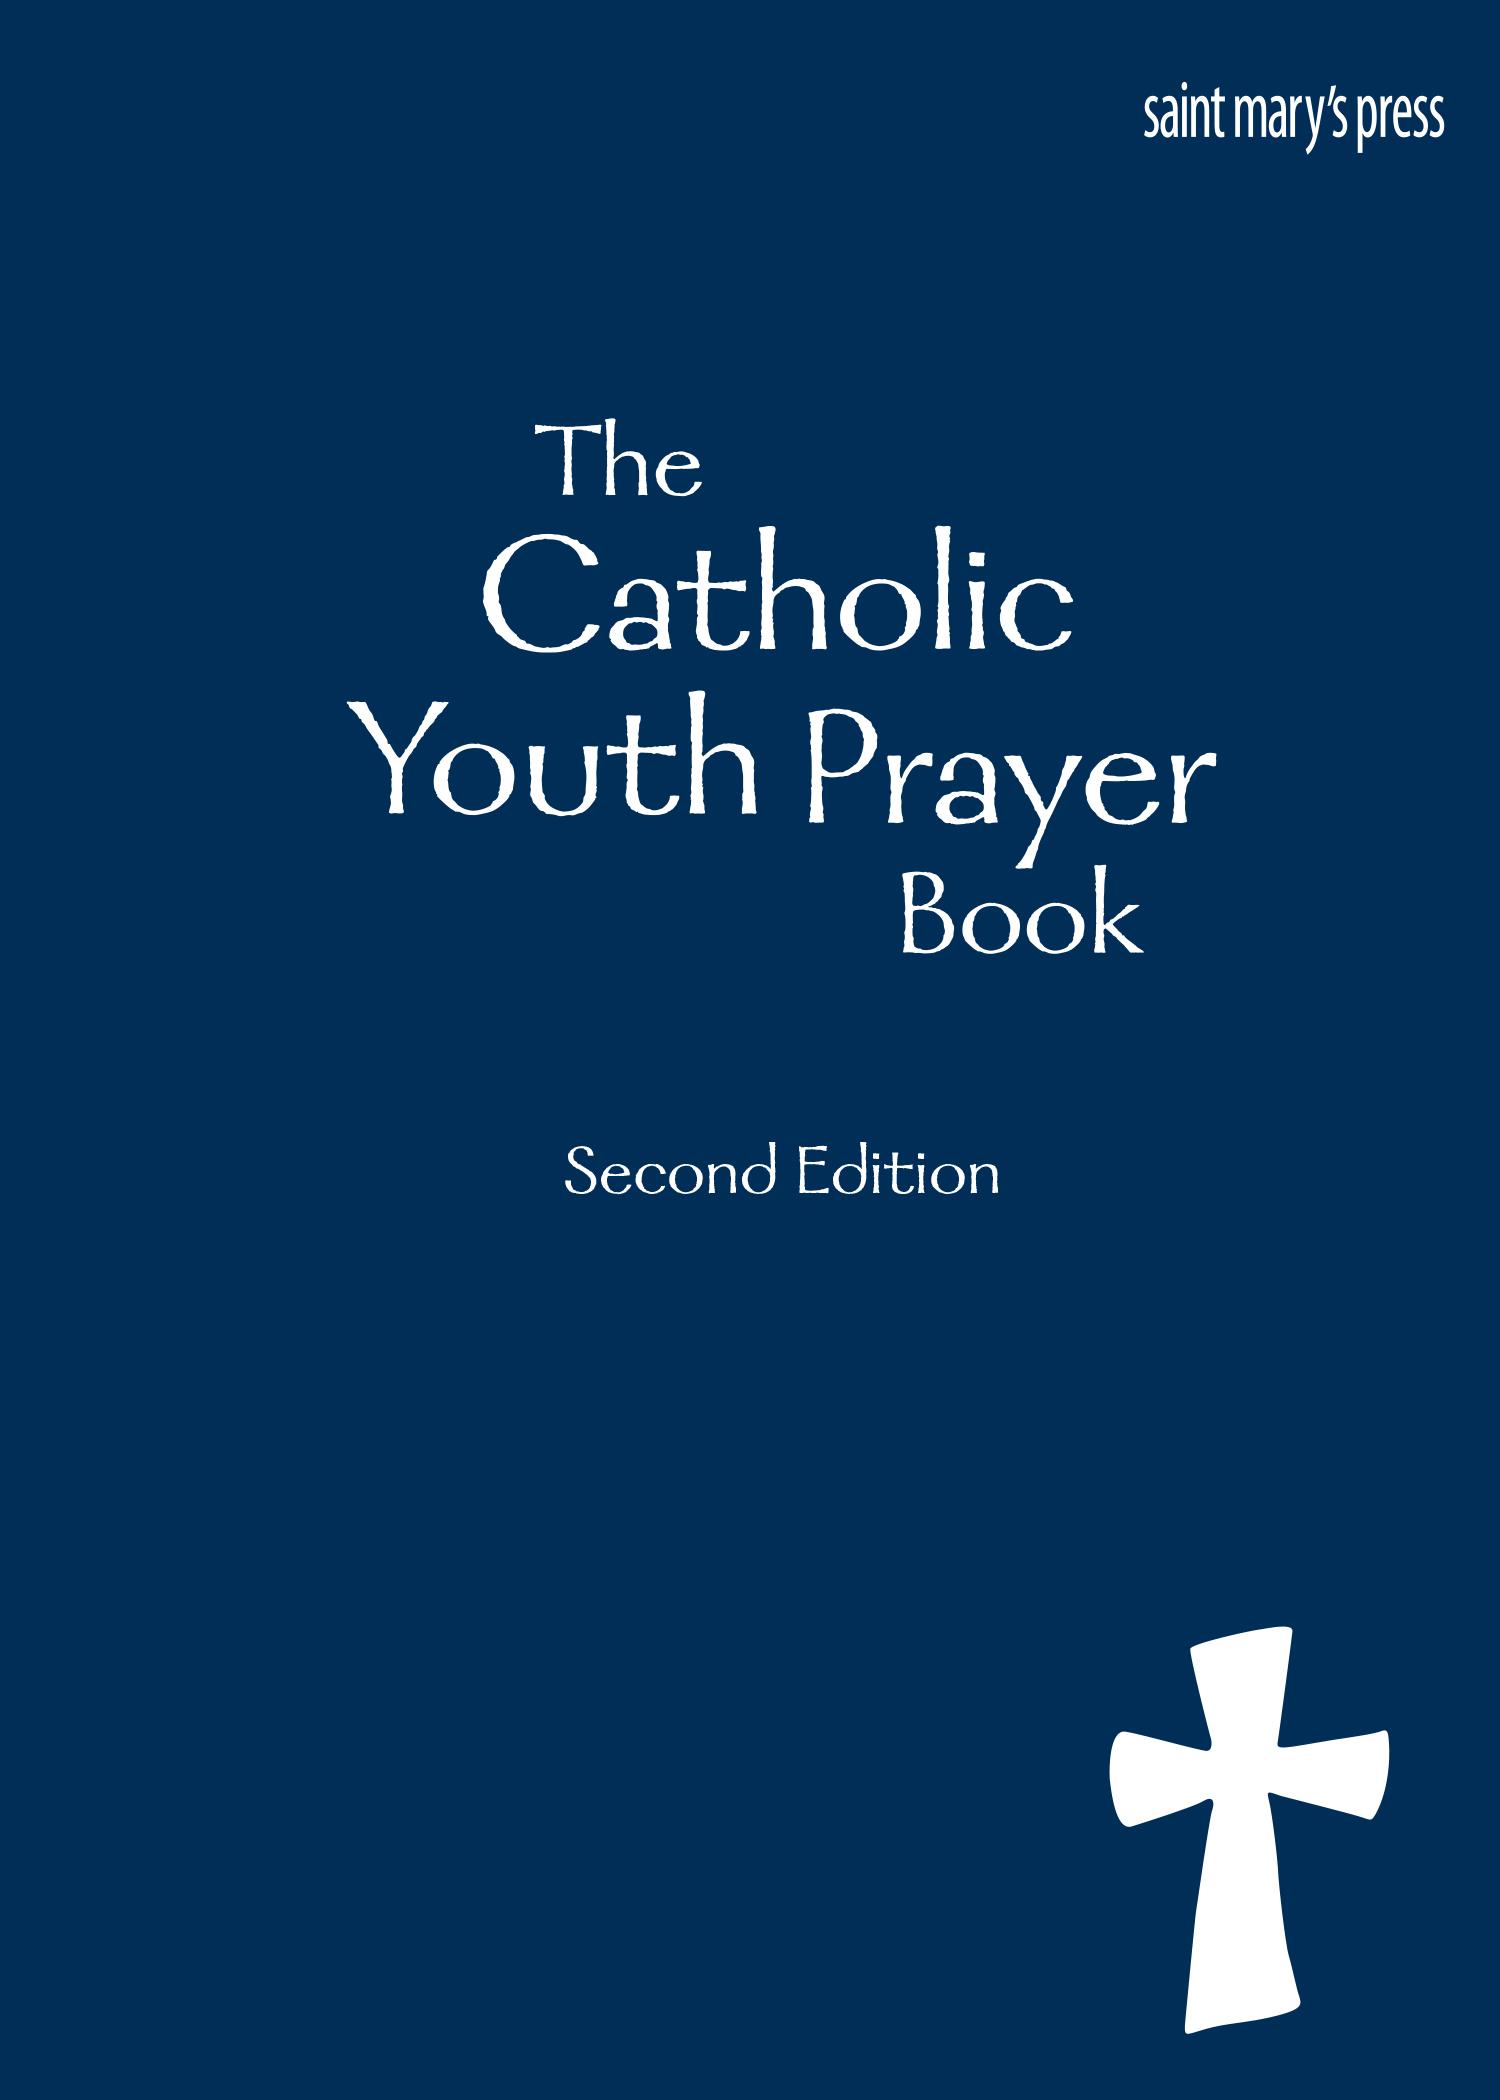 The Catholic Youth Prayer Book, Second Edition PDF - Saint Mary's Press